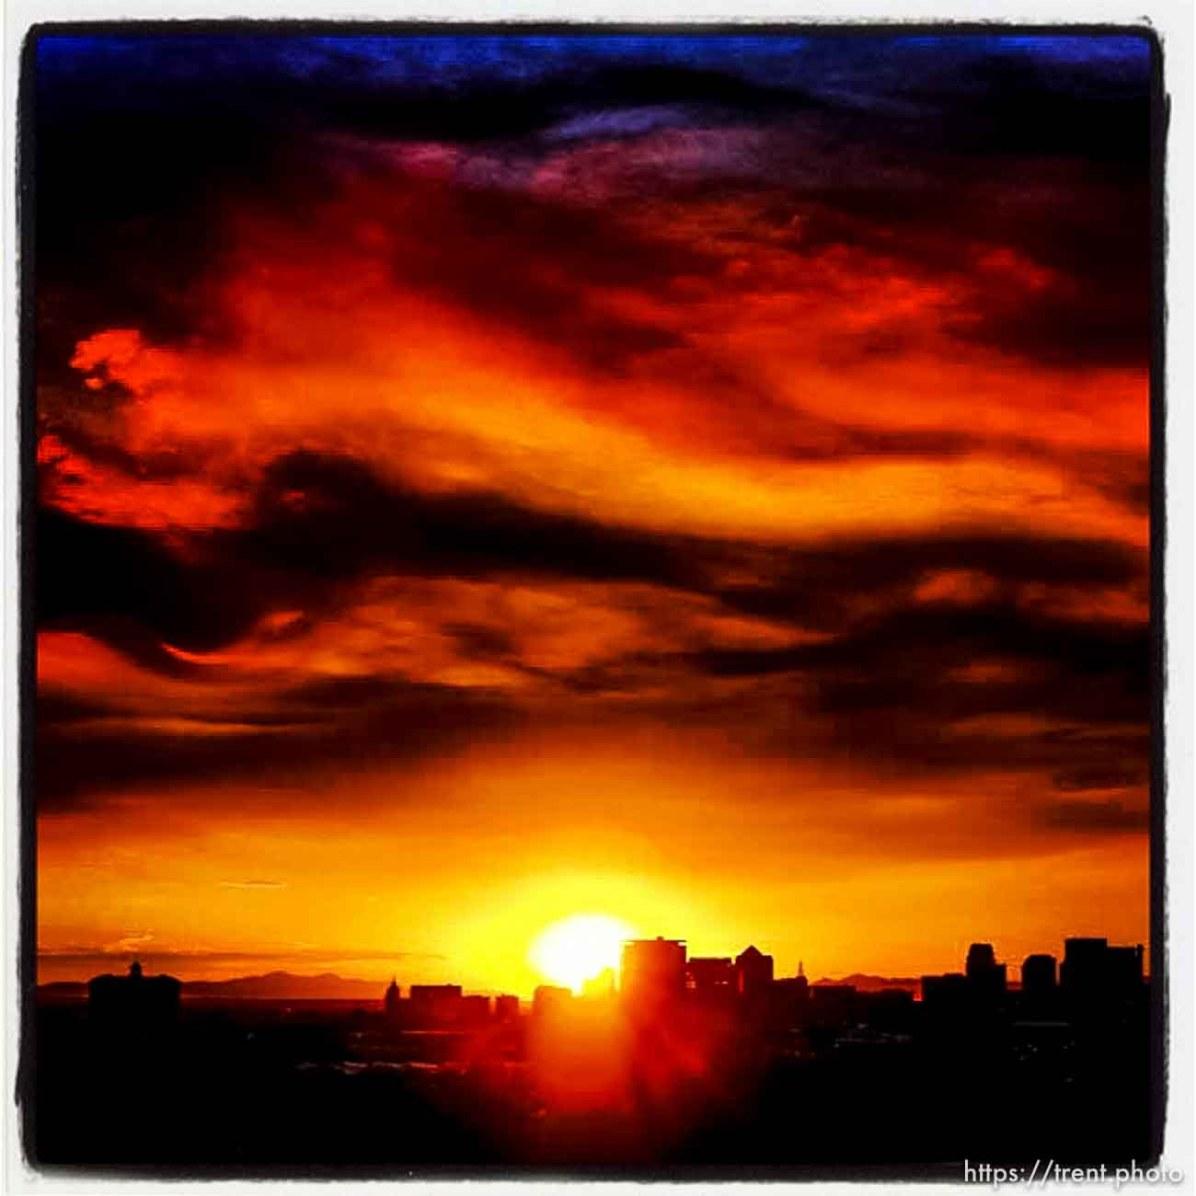 smoky sunset, Sunday August 11, 2013.